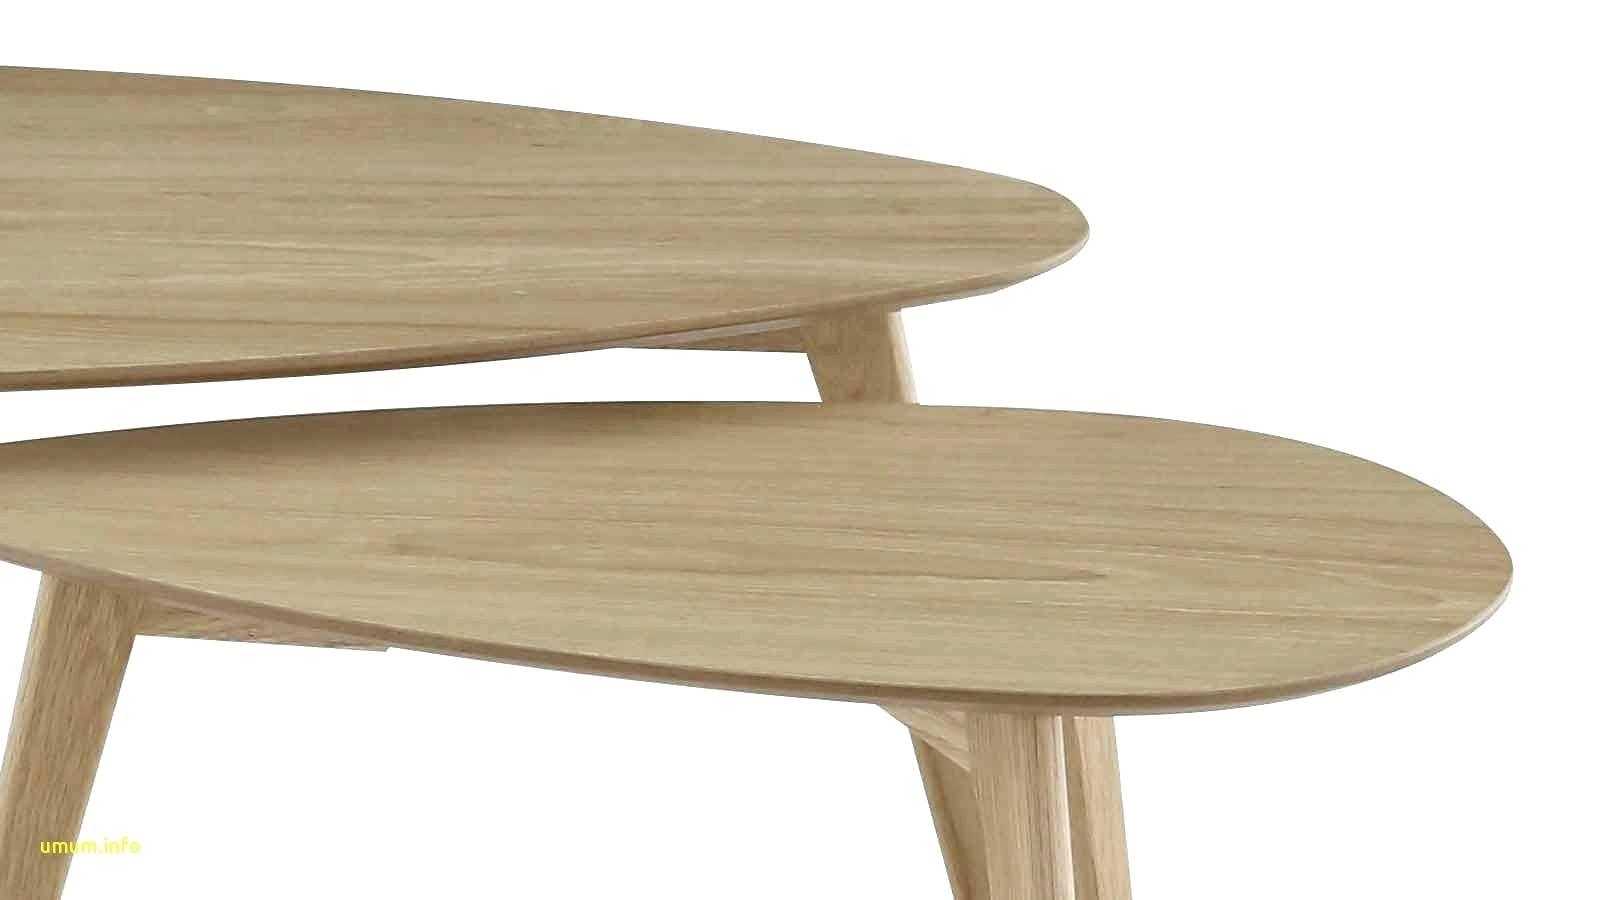 Table basse scandinave alinéa